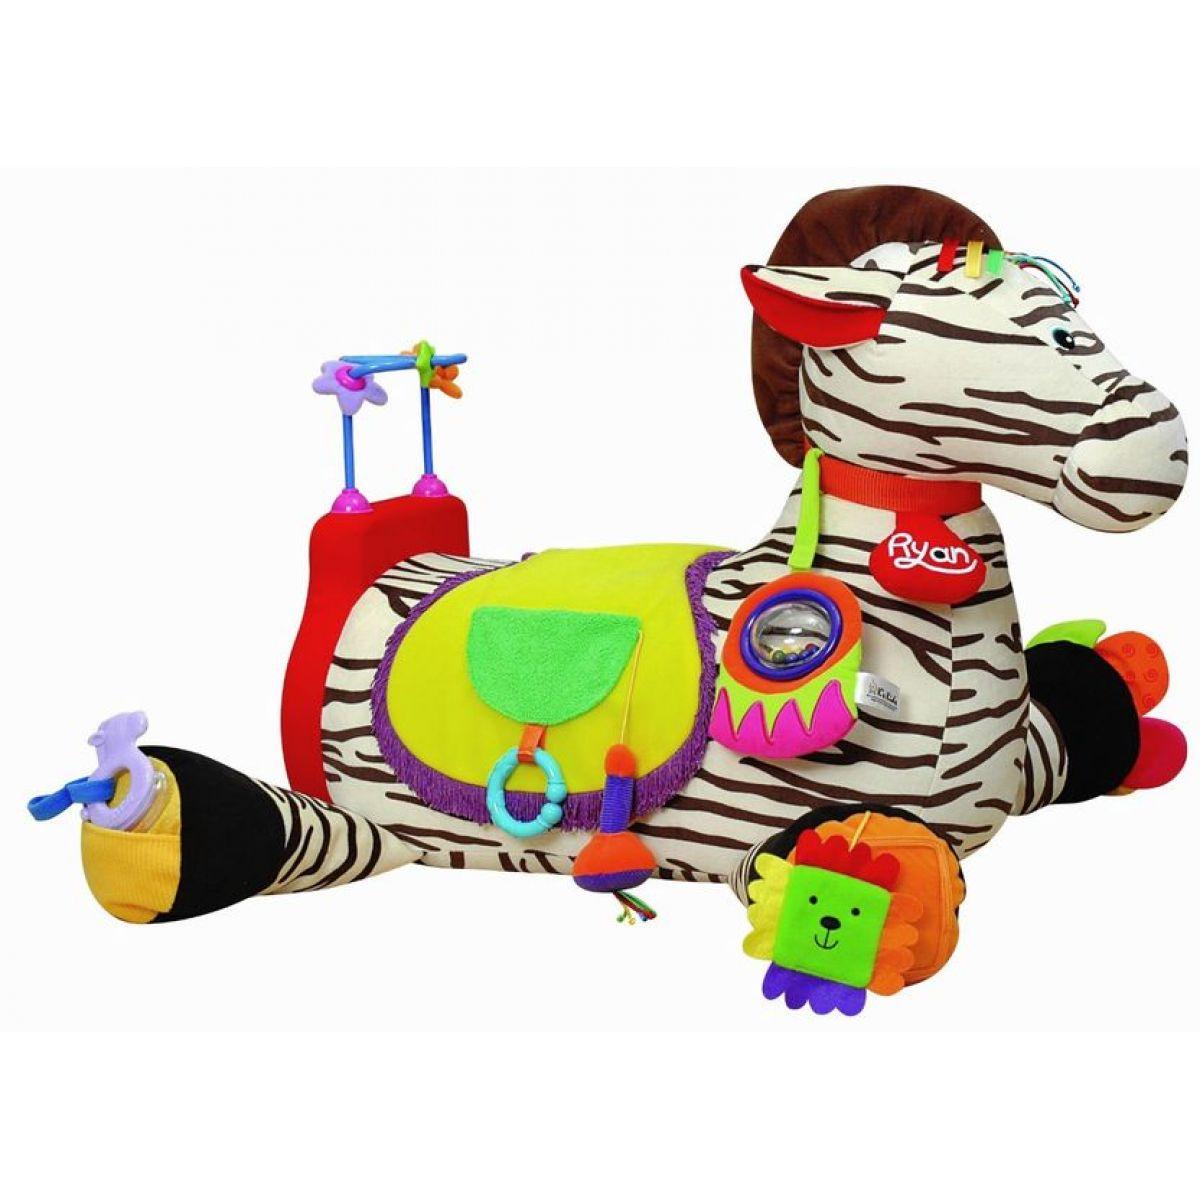 Velká zebra RYAN s 28 funkcemi zábavy